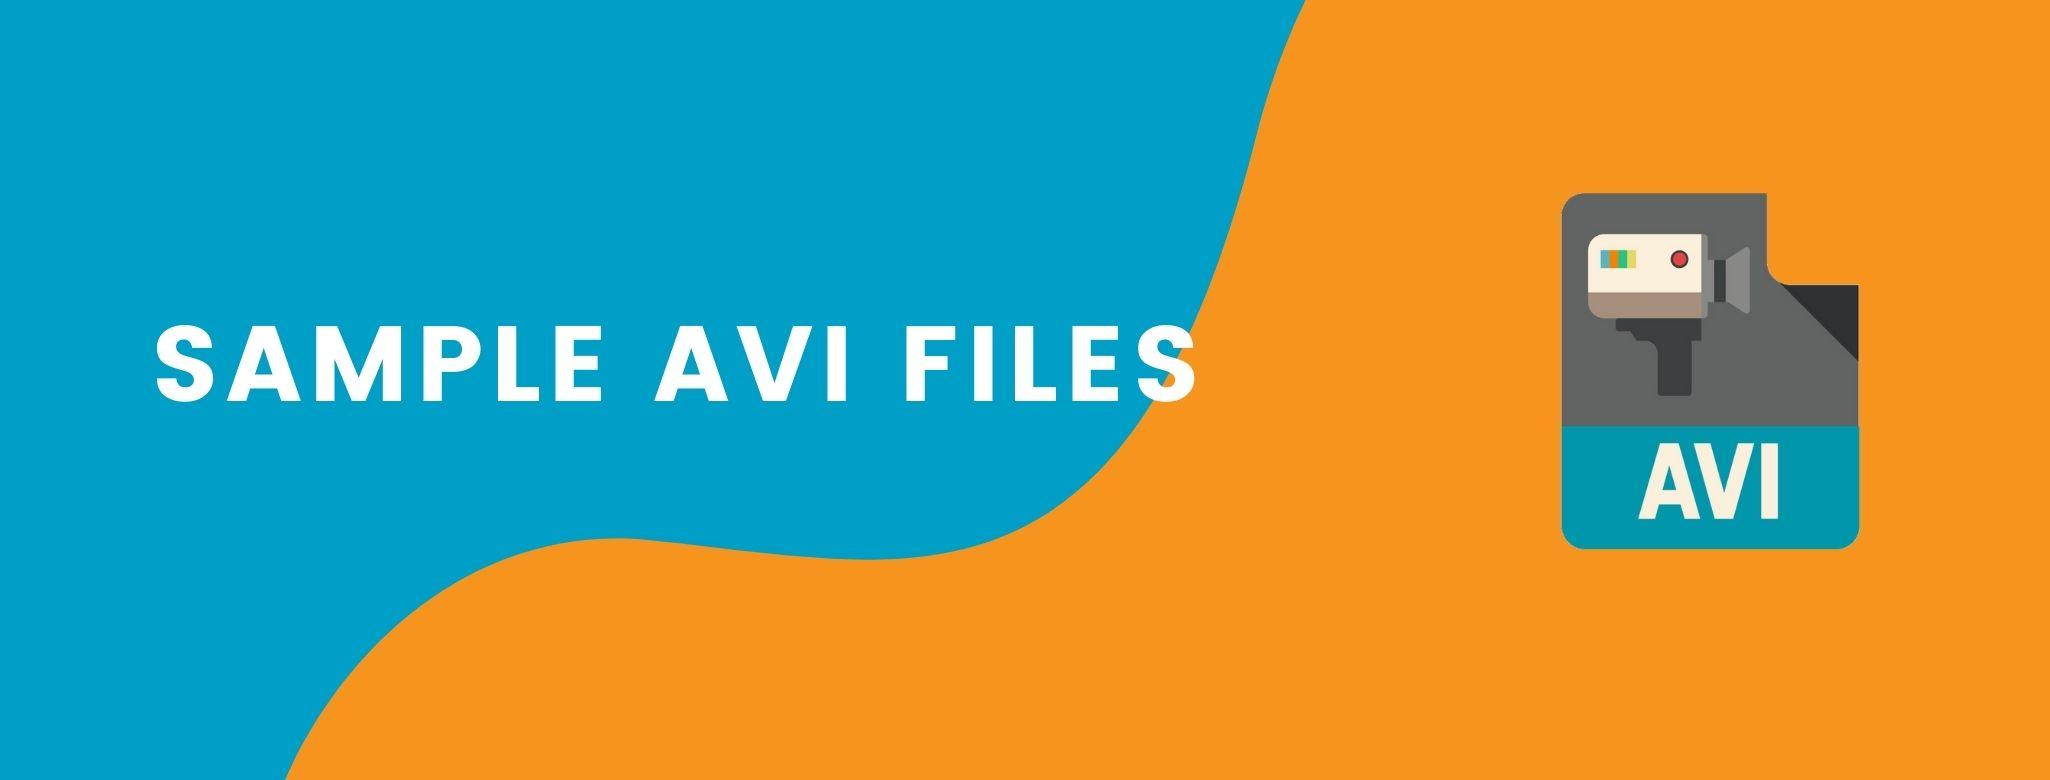 Sample AVI Files